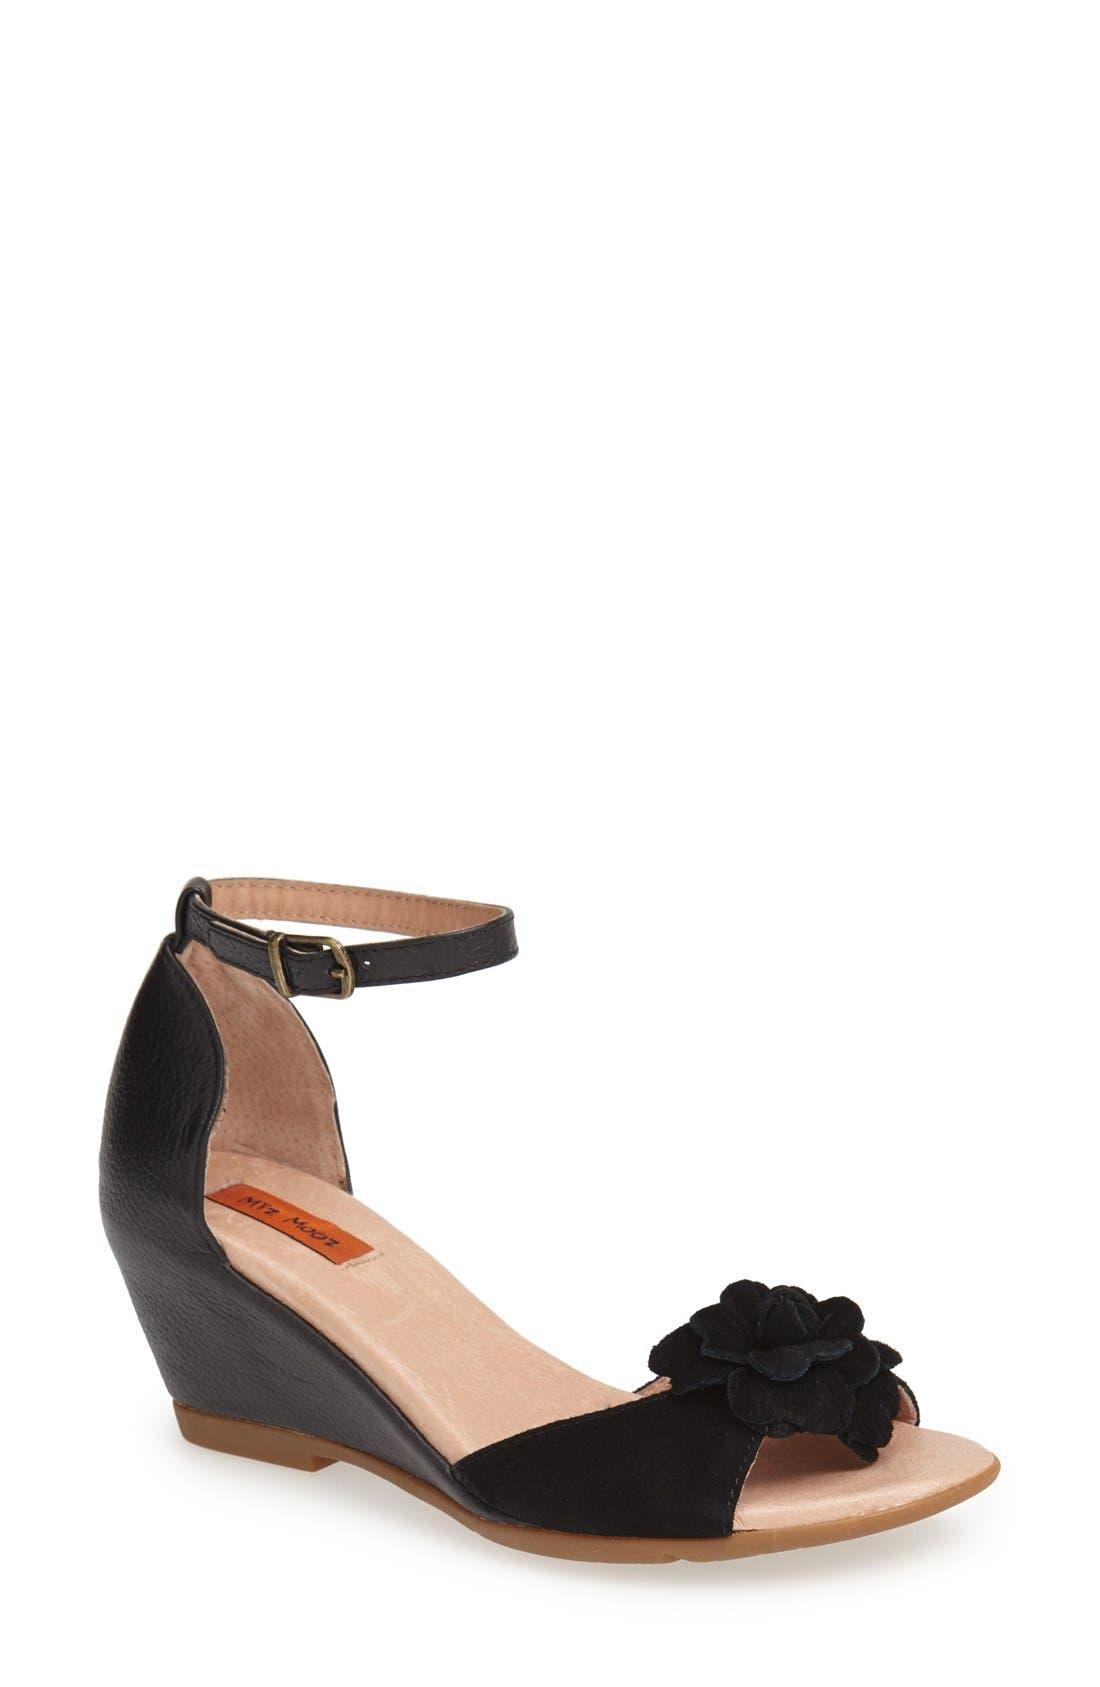 Main Image - Miz Mooz 'Carmen' Leather Wedge Sandal (Women)(Special Purchase)